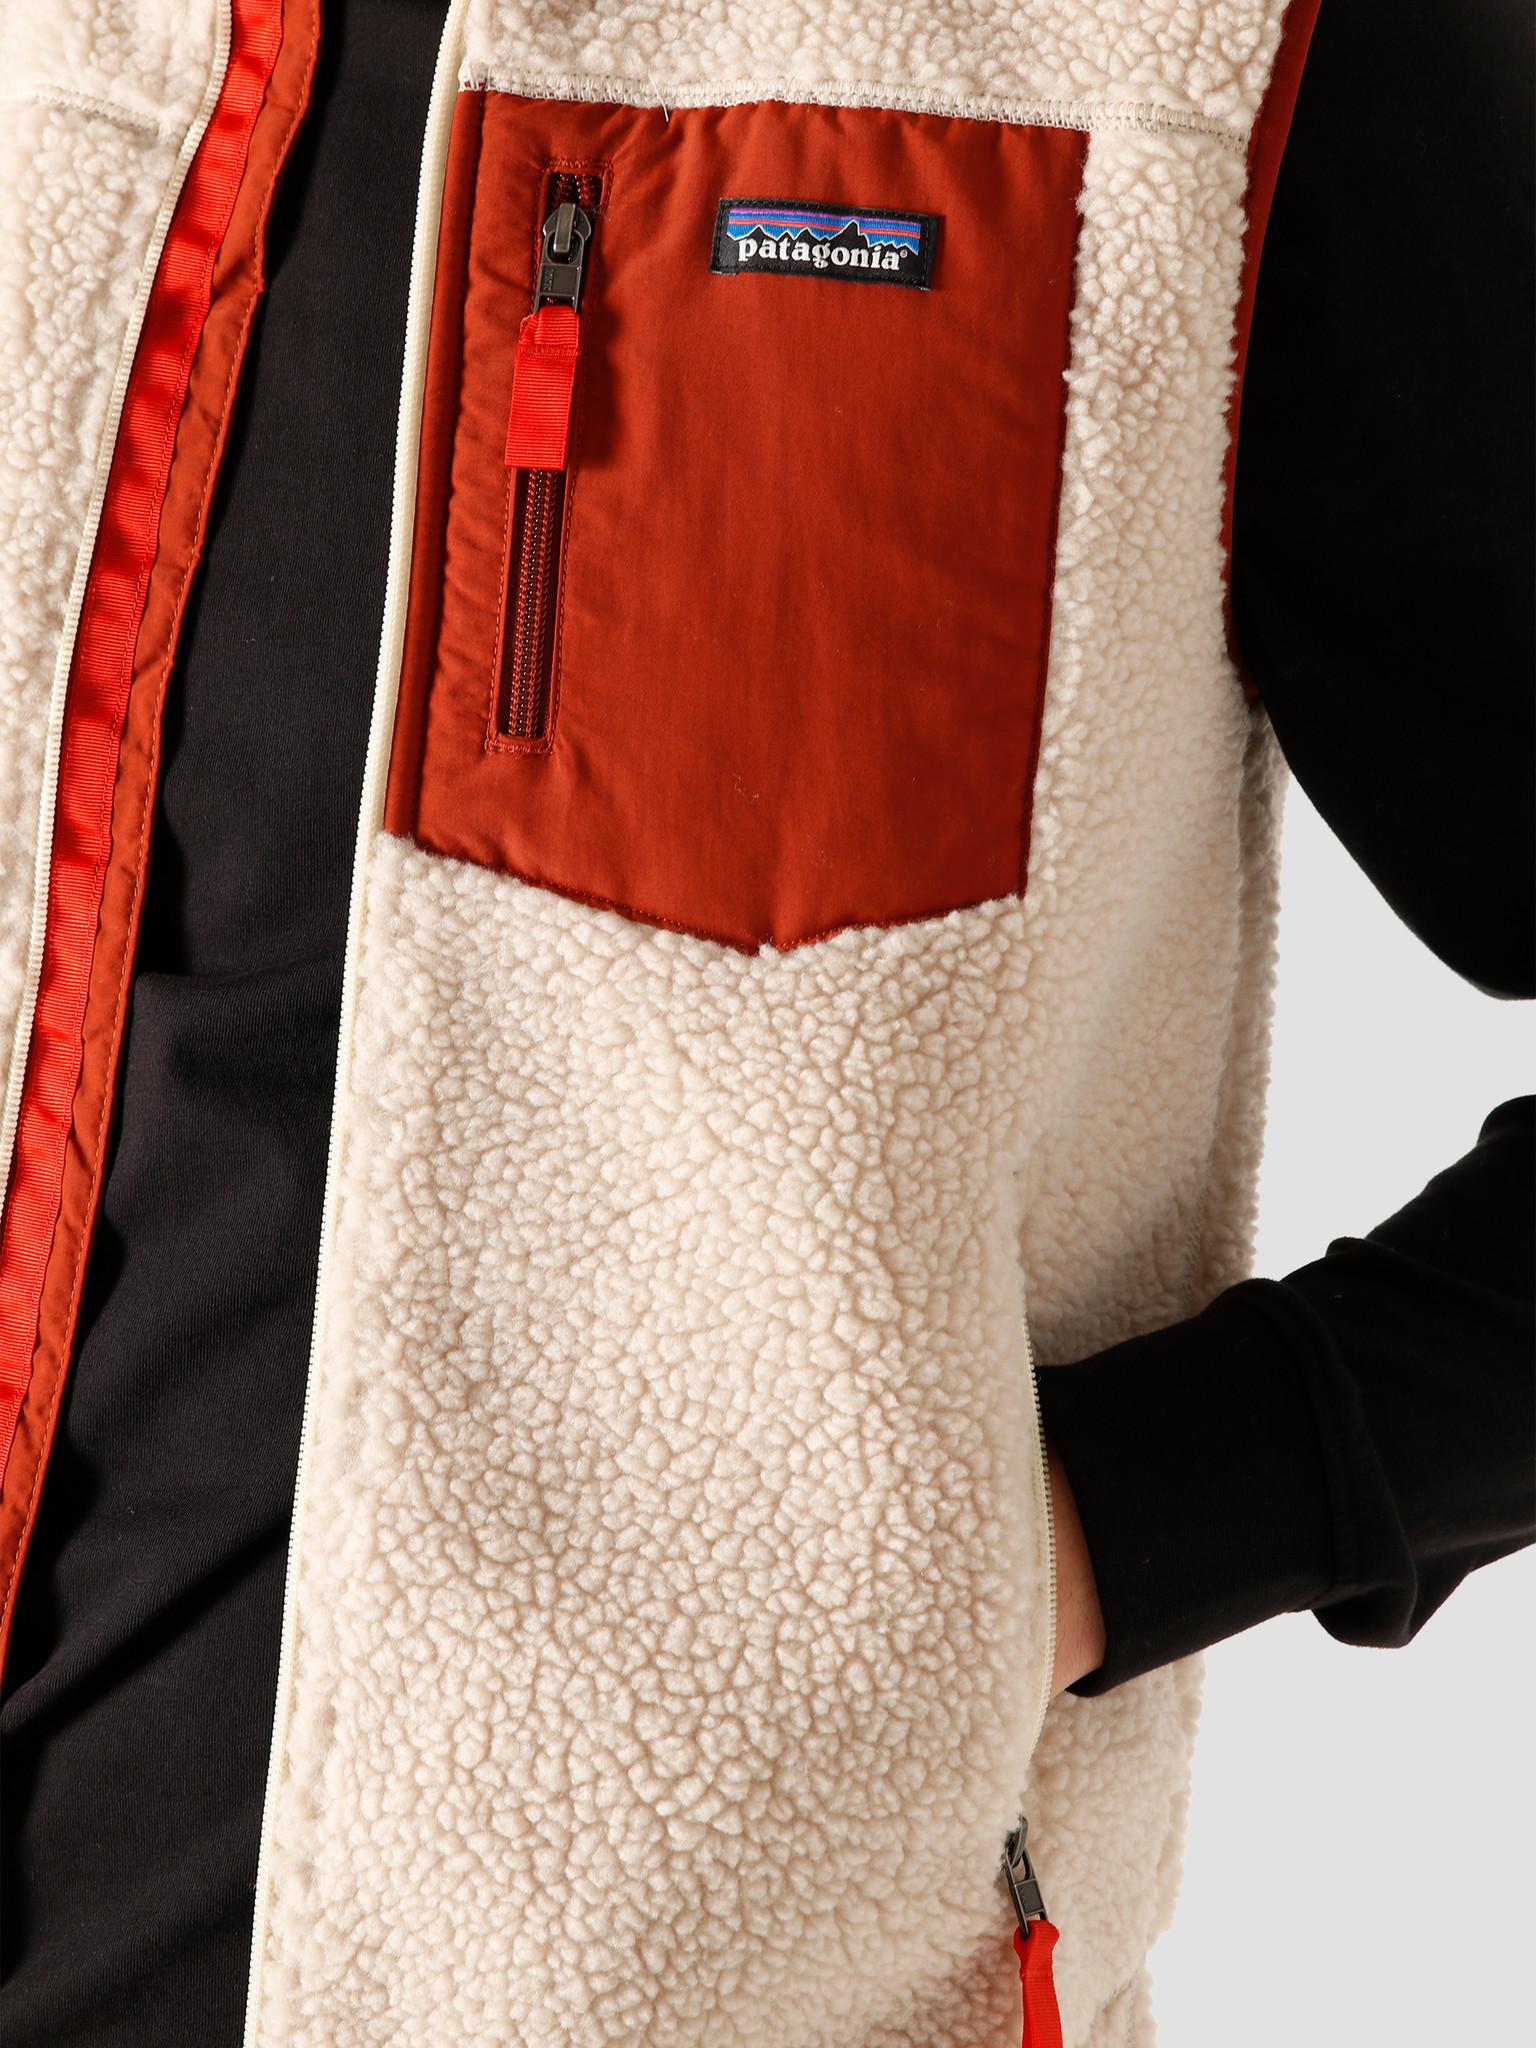 Patagonia Patagonia M's Classic Retro-X Vest Natural Barn Red 23048